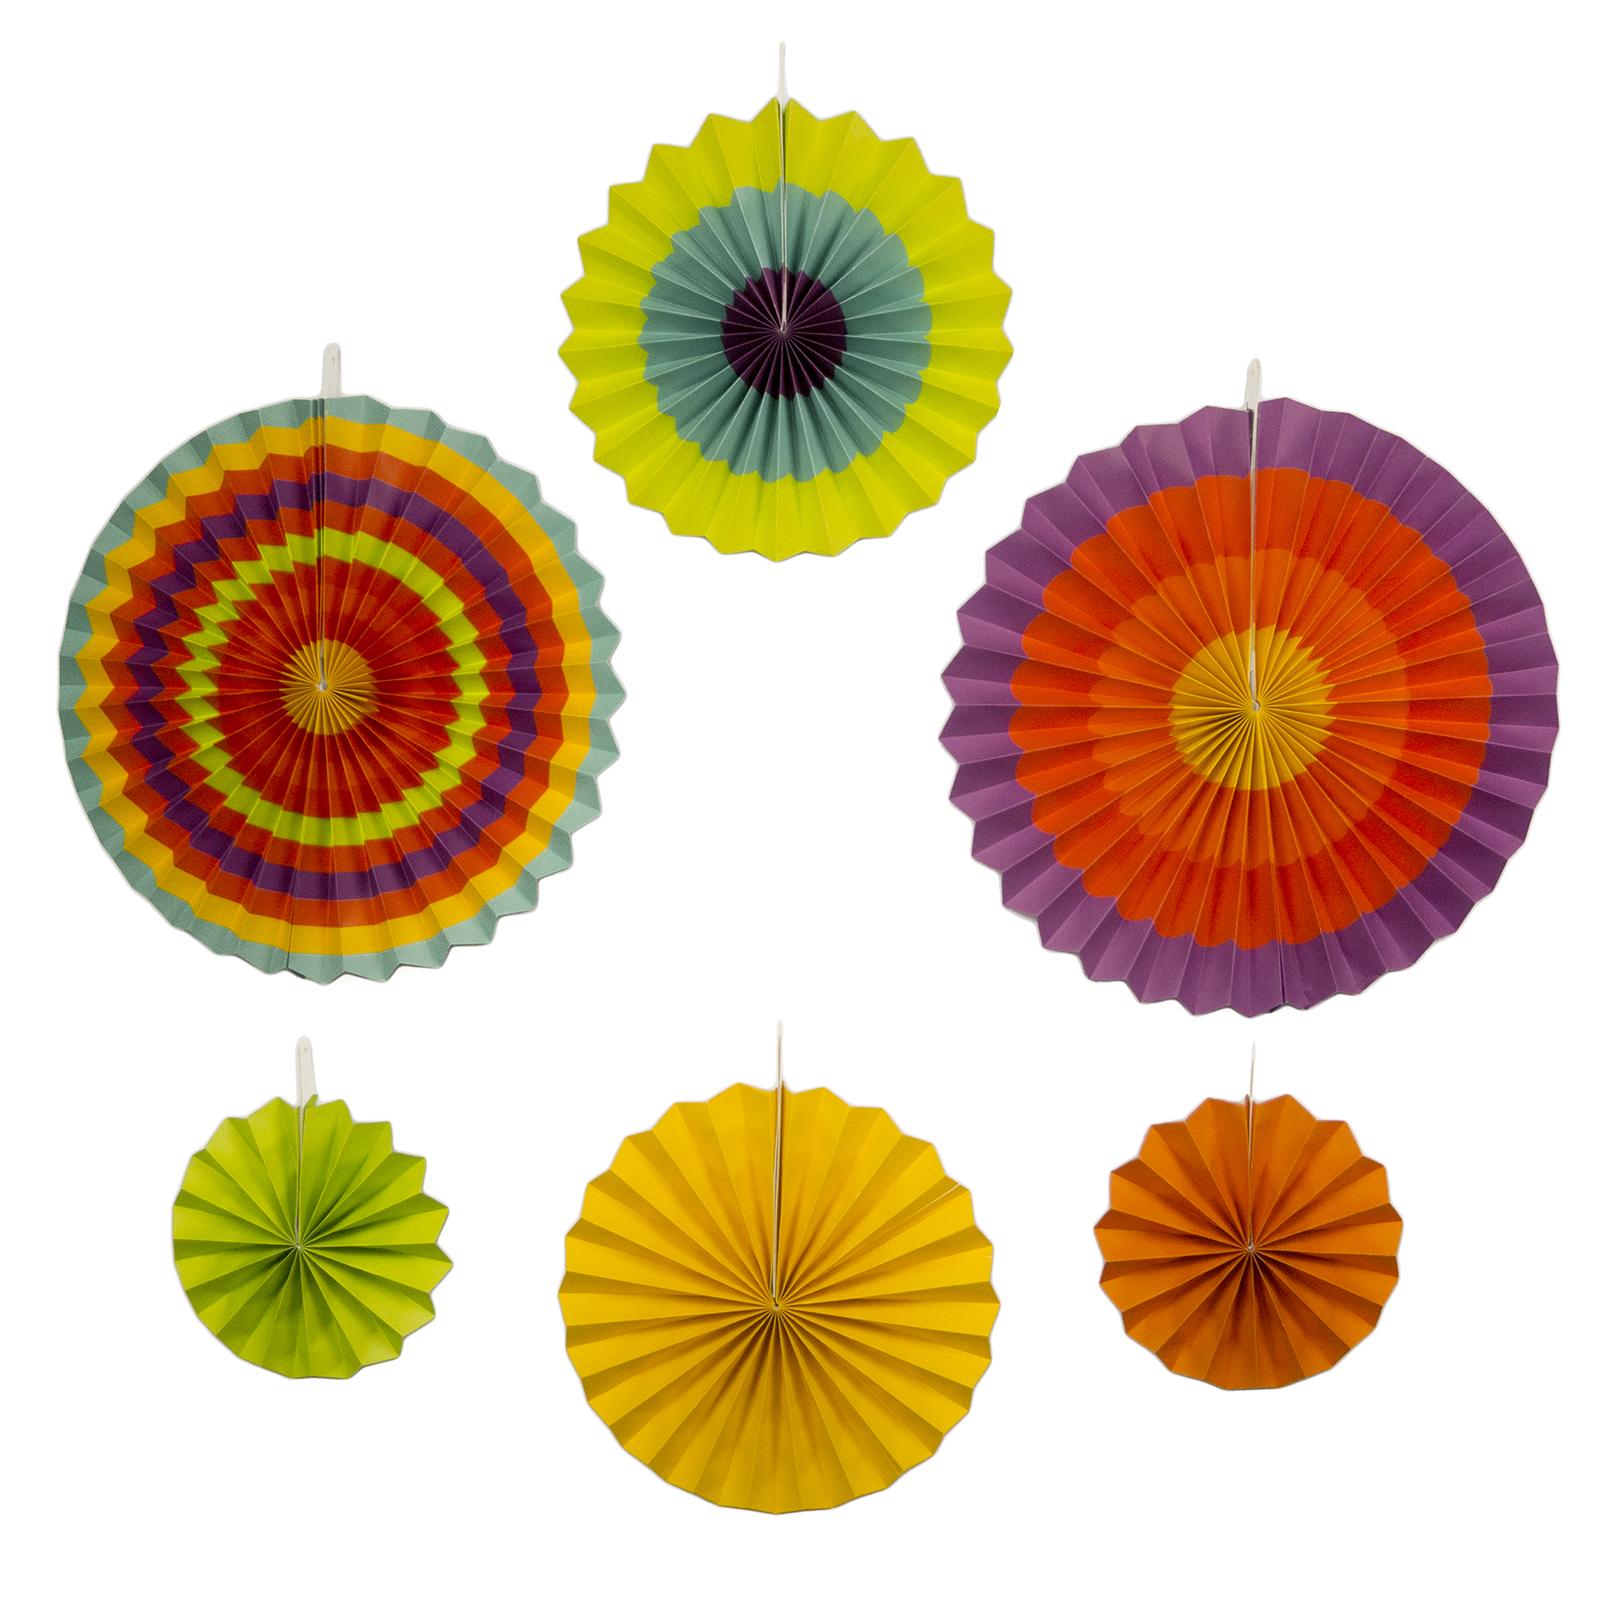 new fiesta paper fan decorations 6 assorted fans 5 de mayo party southwestern decoration - Fiesta Decorations